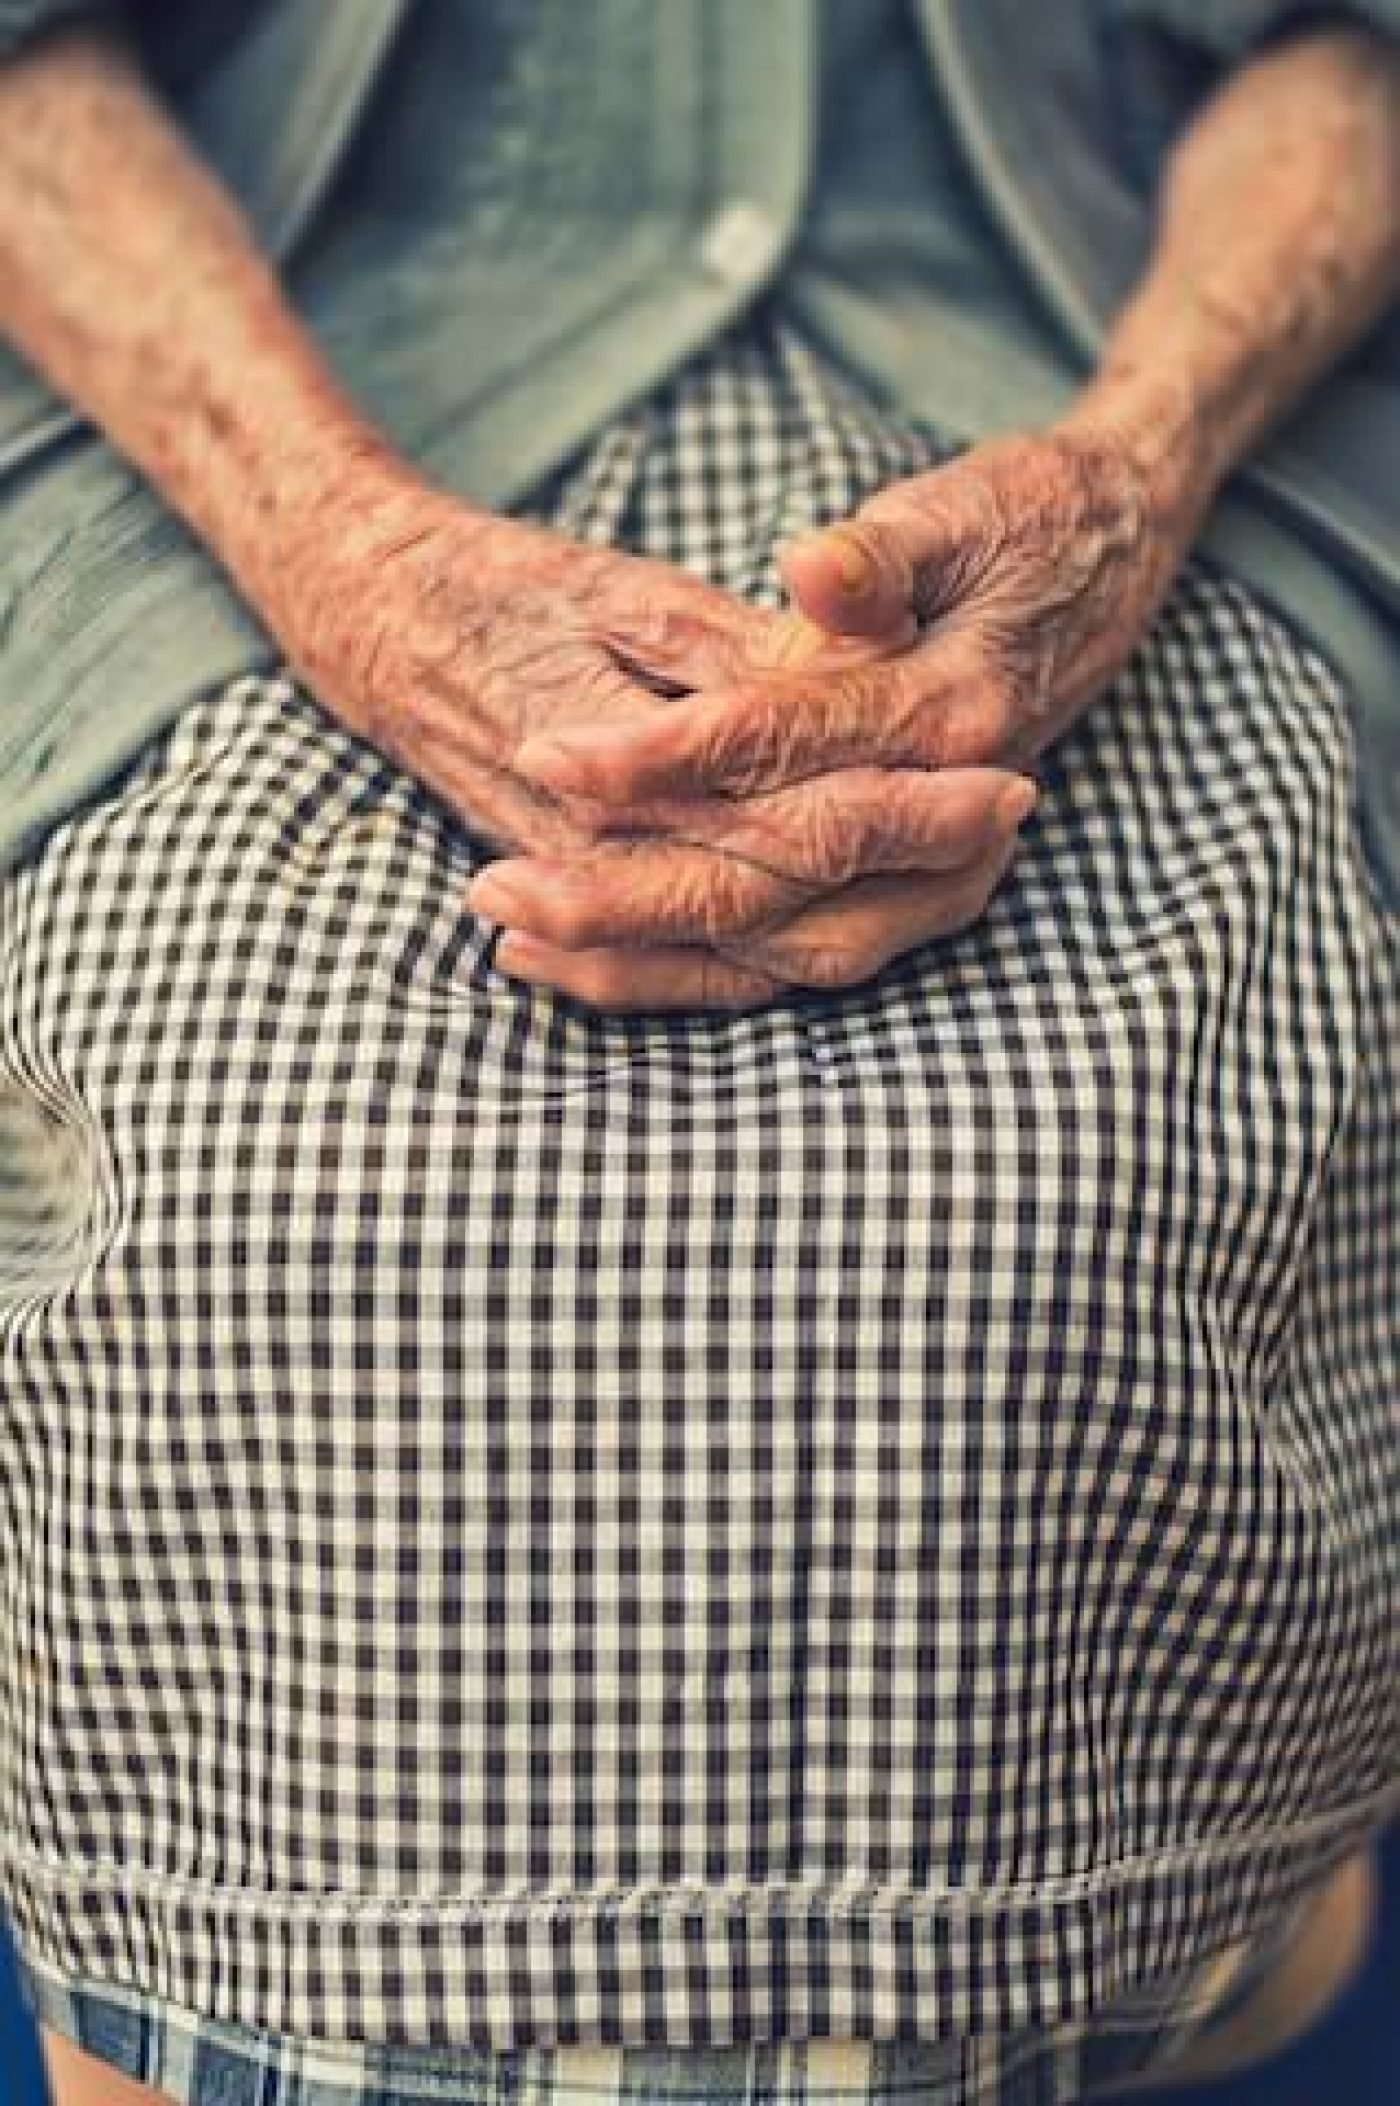 Elder abuse signs & symptoms